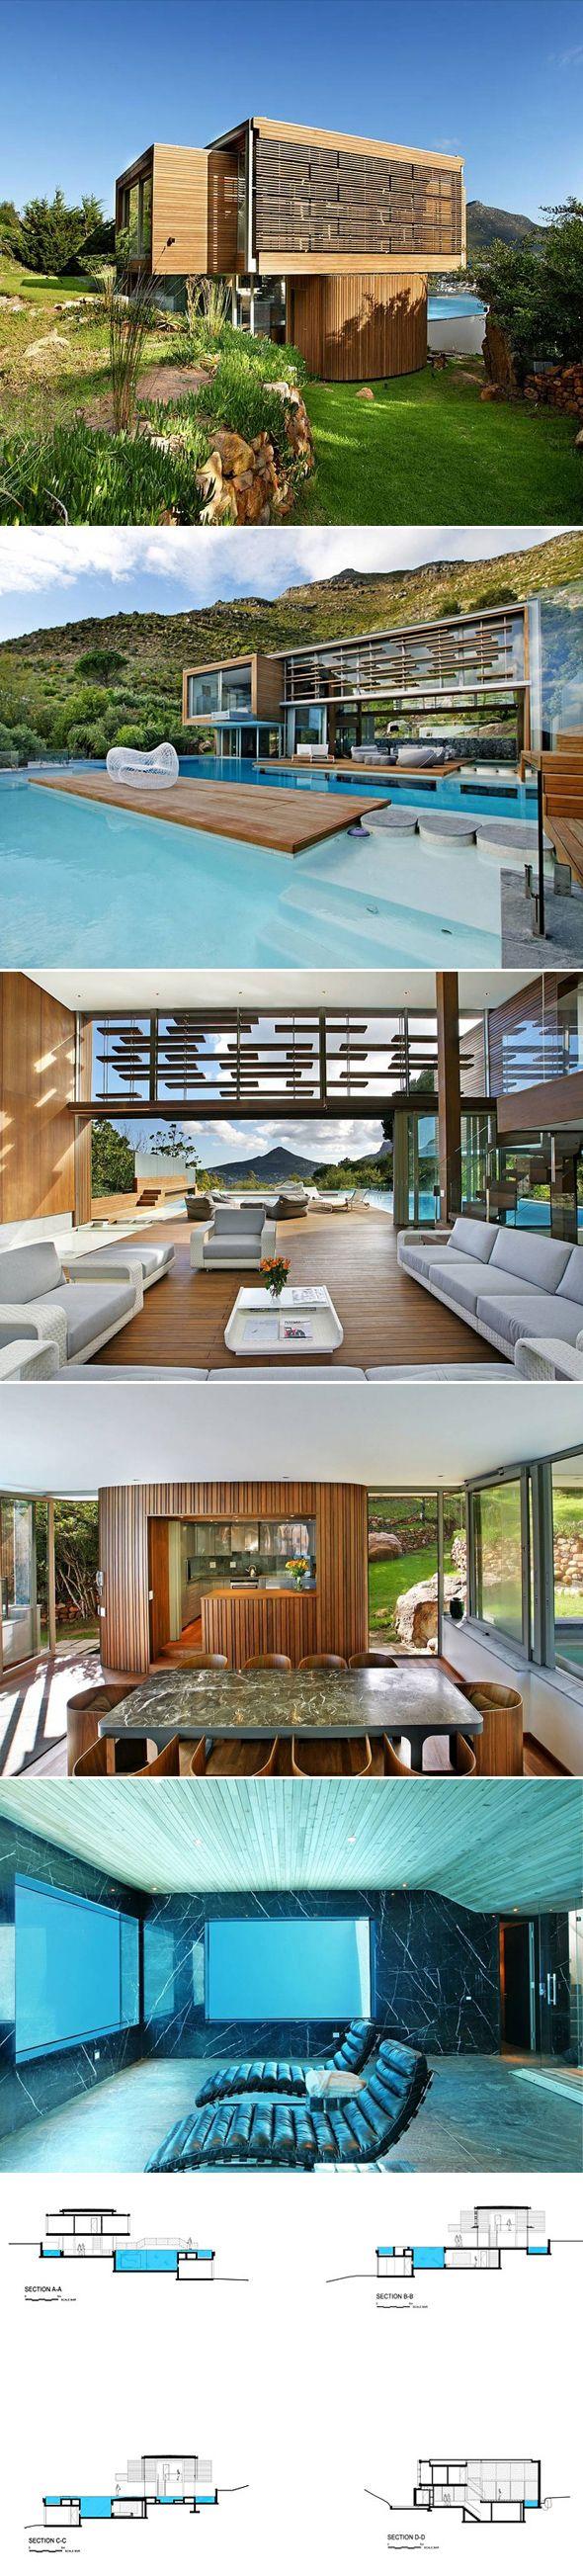 Spa House par Metropolis Design   Ich freue mich auf, Architektur ...